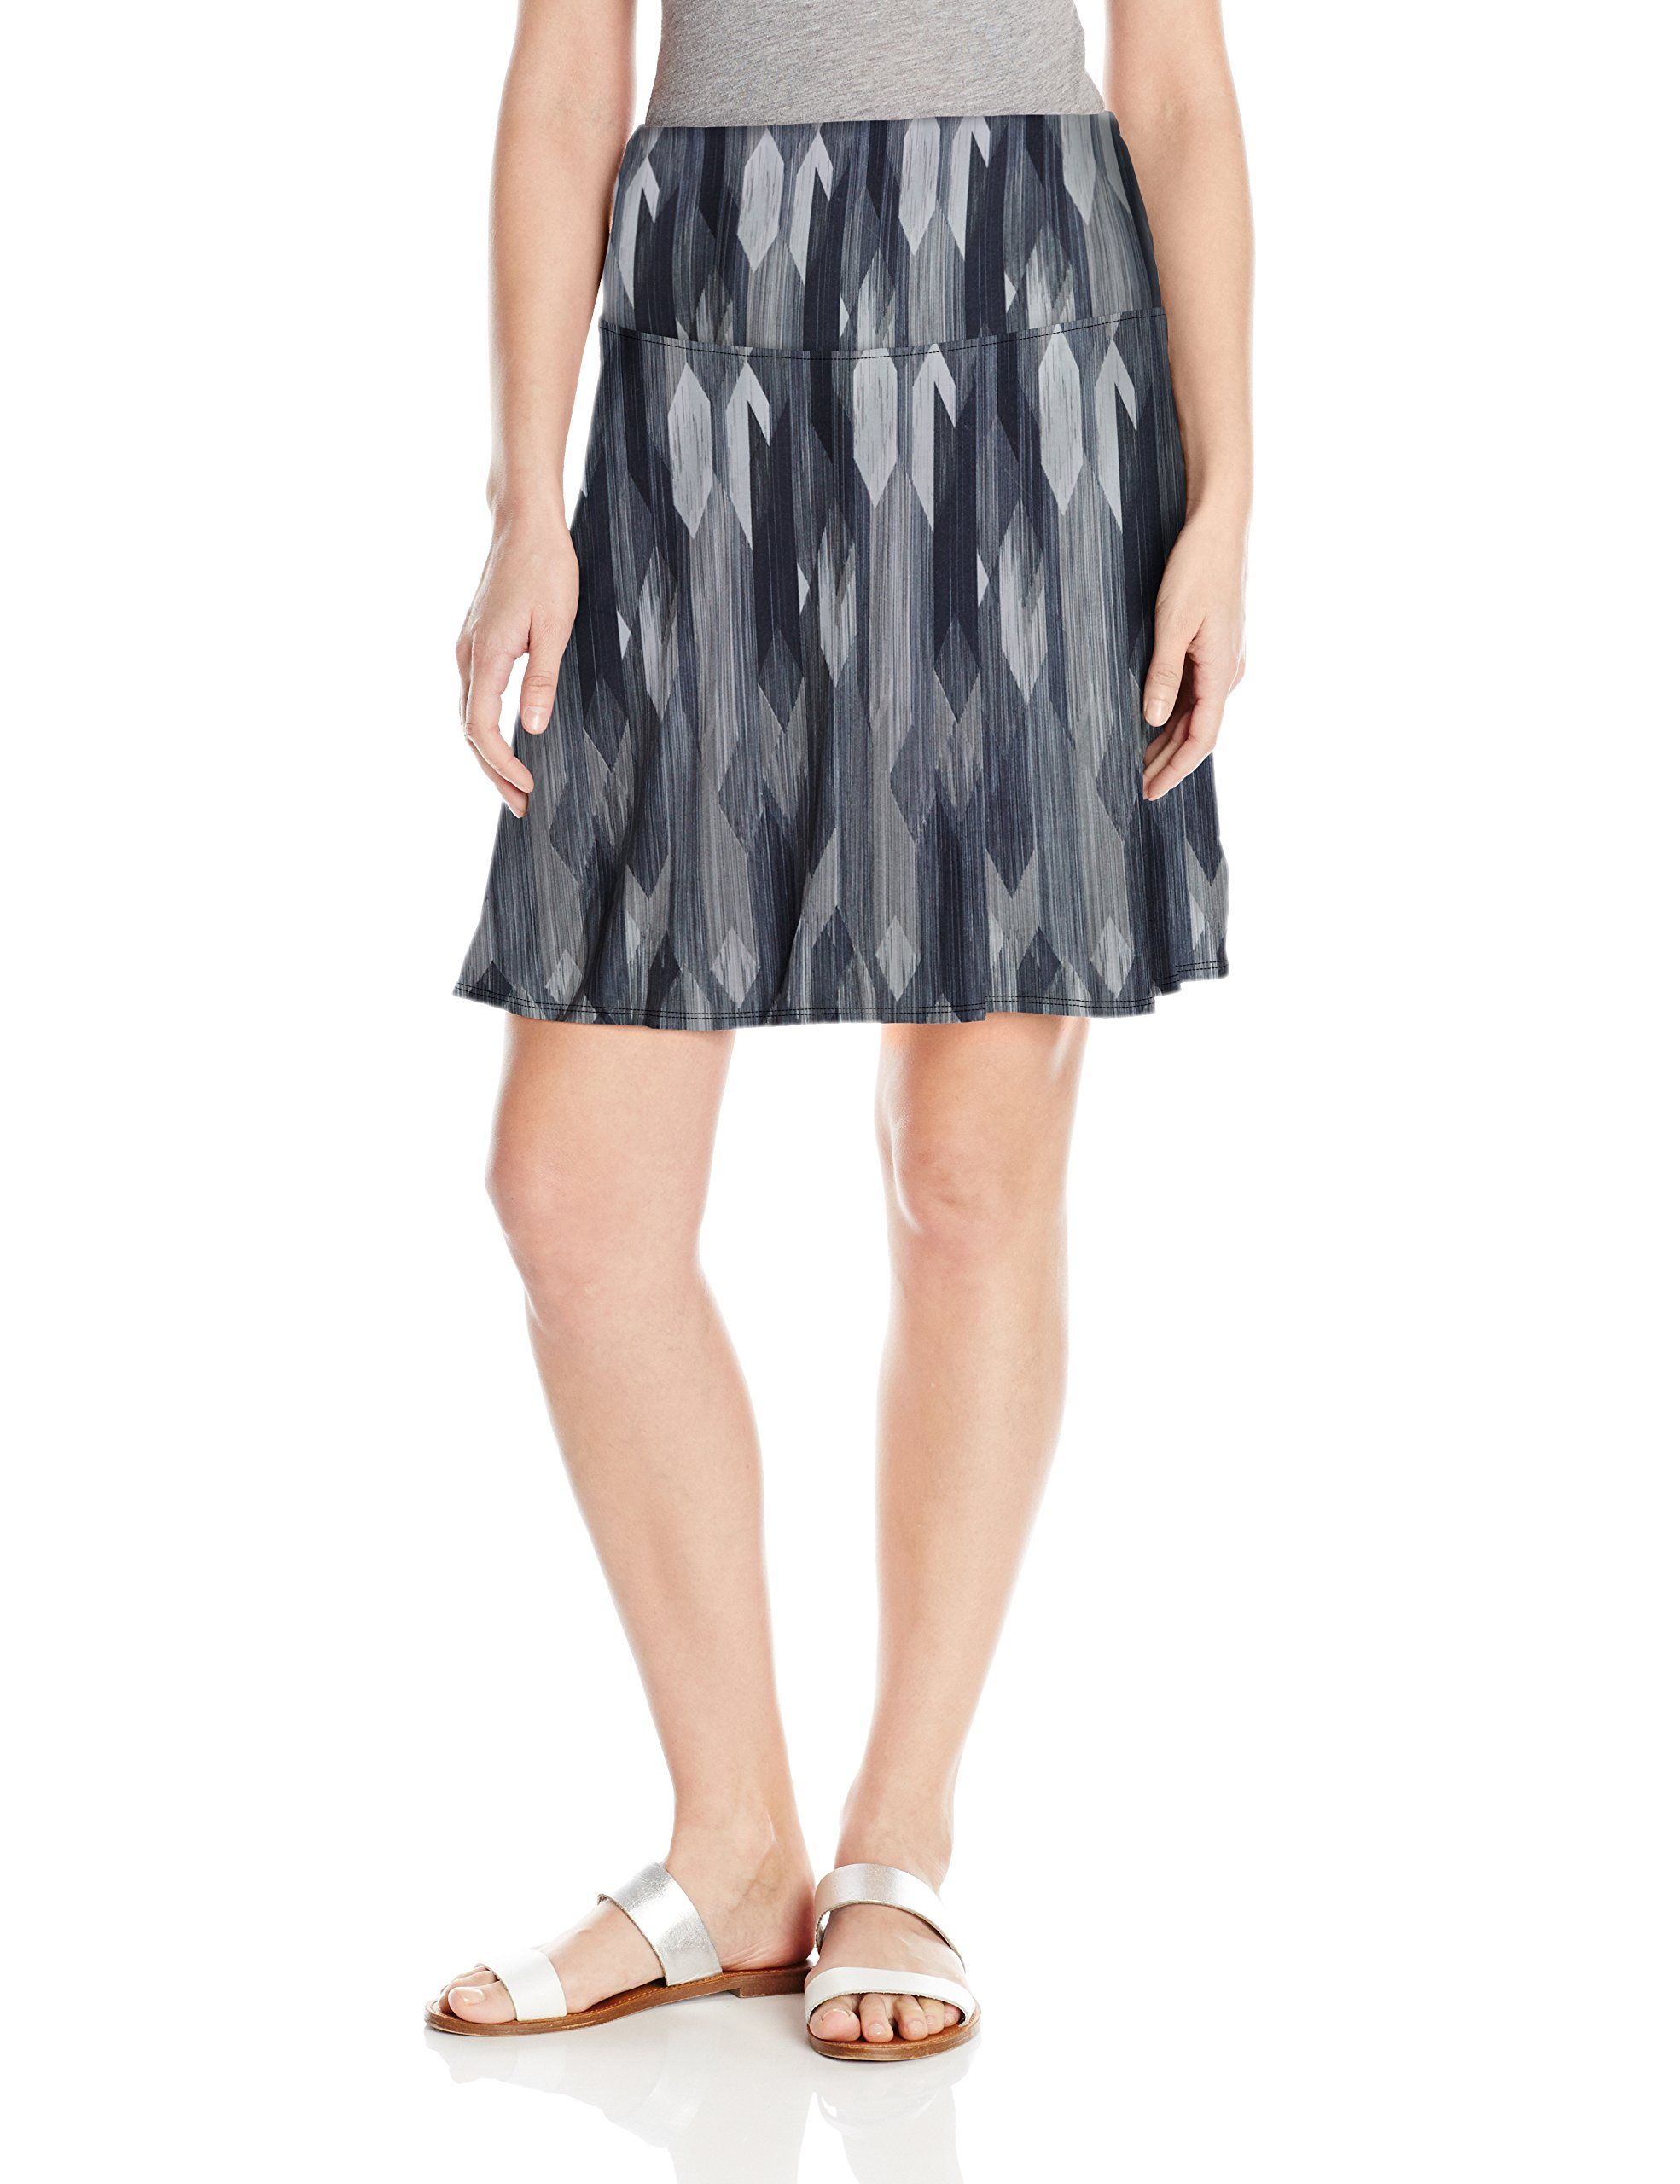 prAna Women's Taj Printed Skirt, Charcoal Gemstone, X-Small by prAna (Image #1)